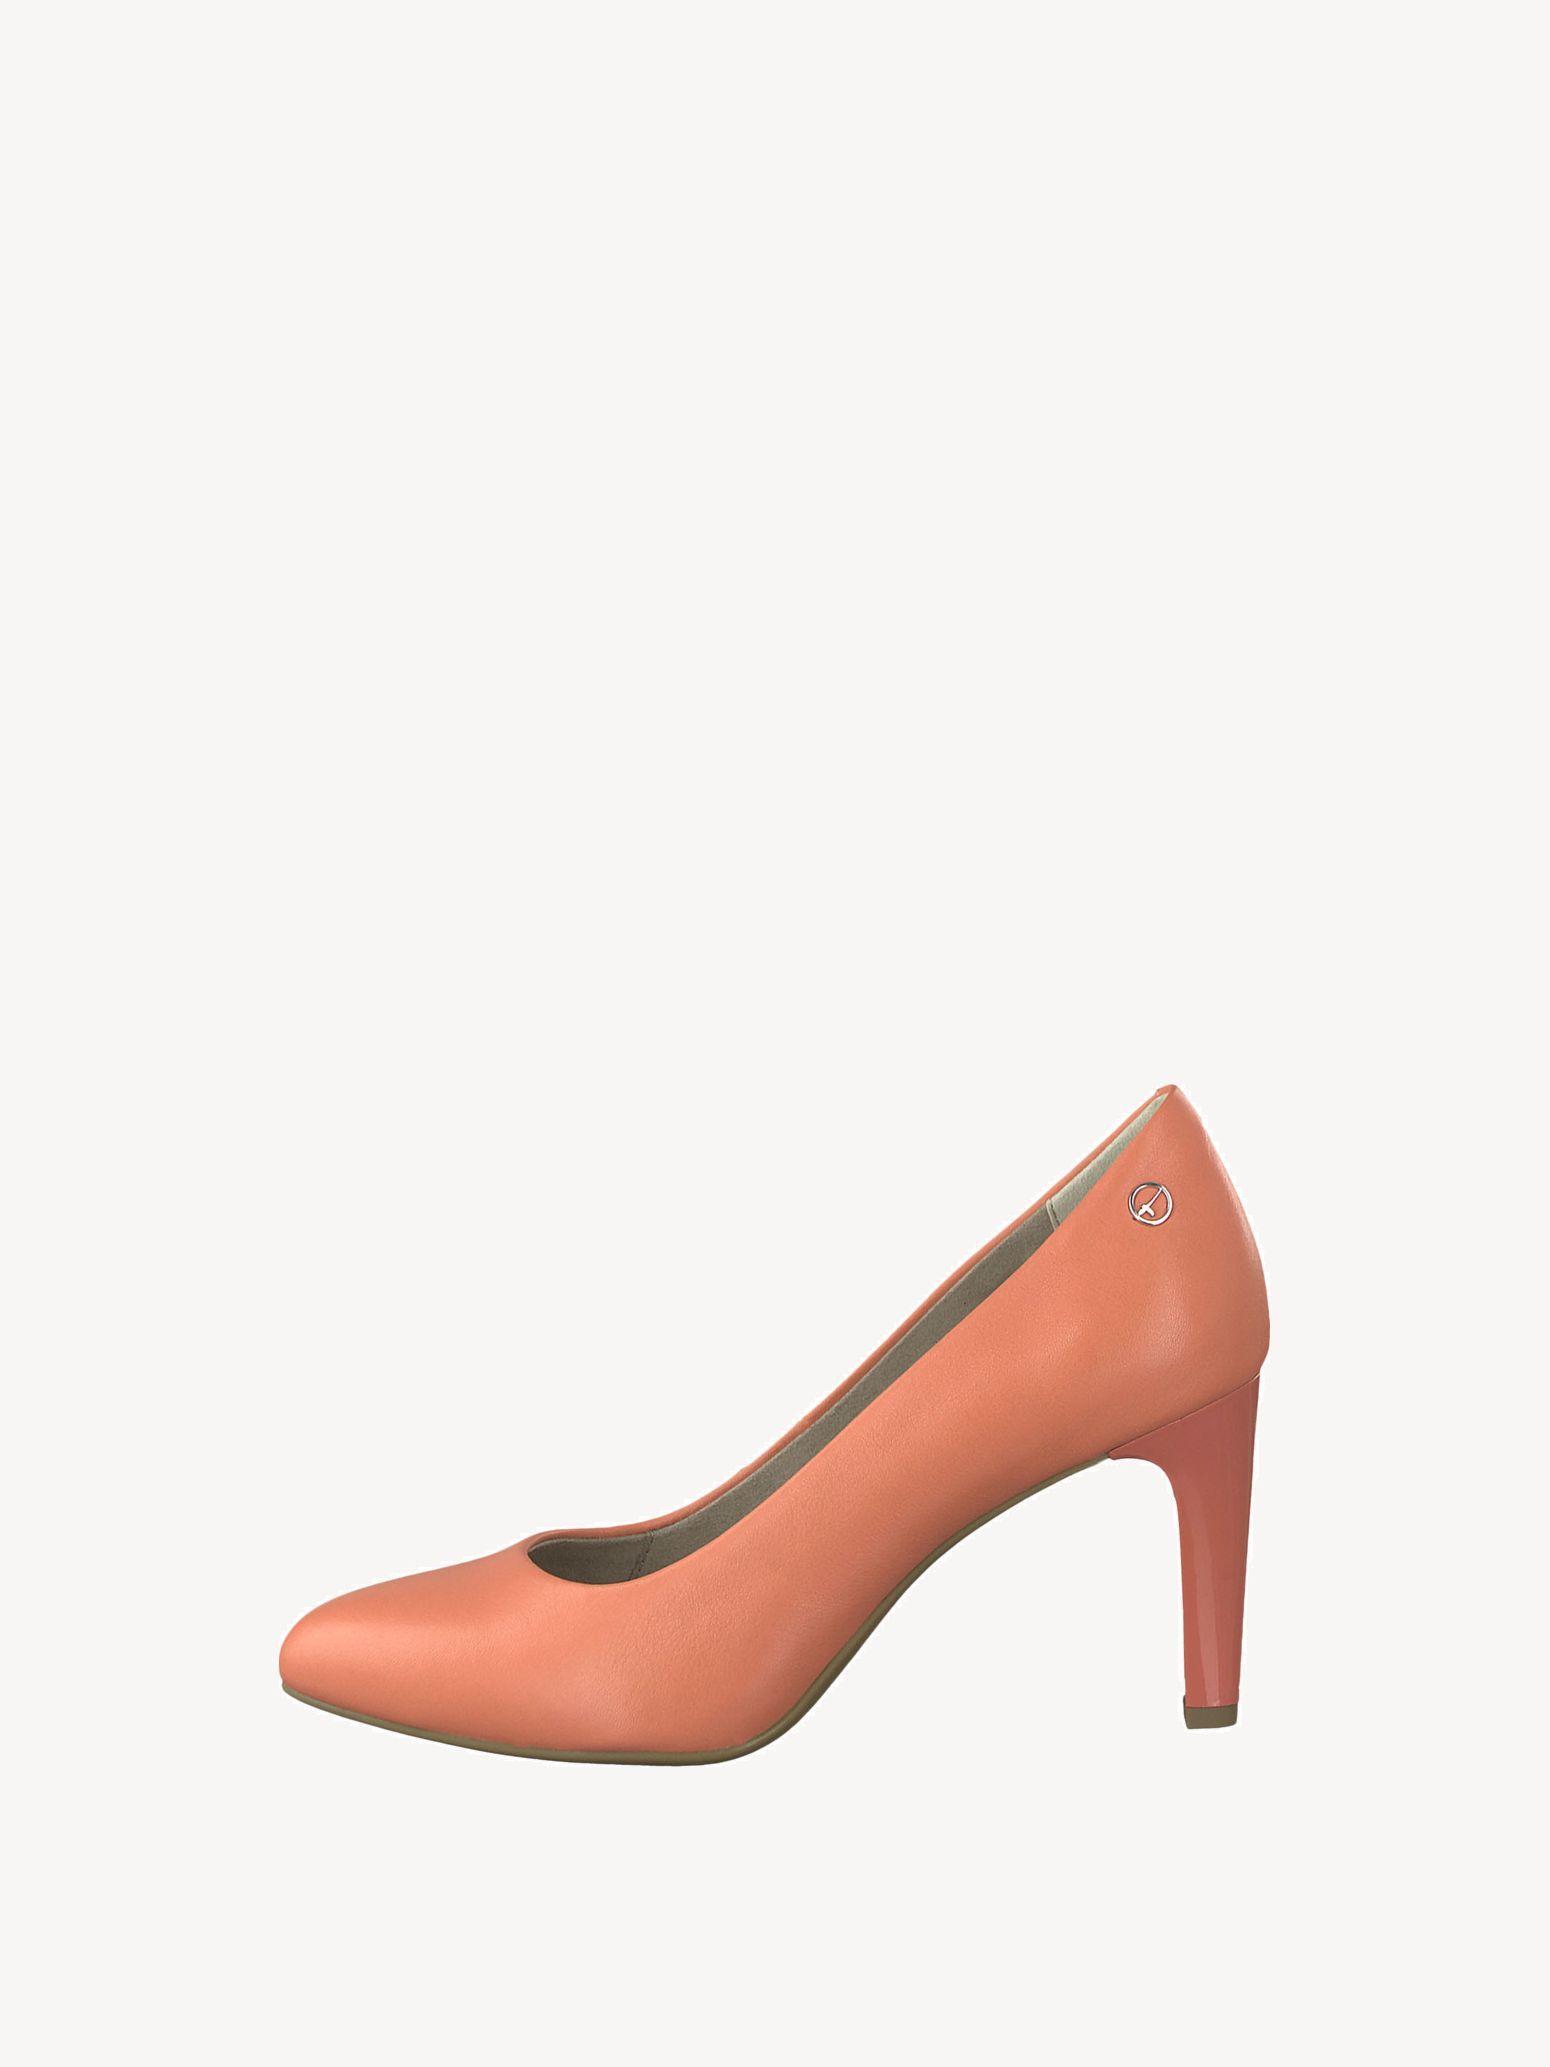 Tamaris Pumps, Classics Heels for Women for sale | eBay